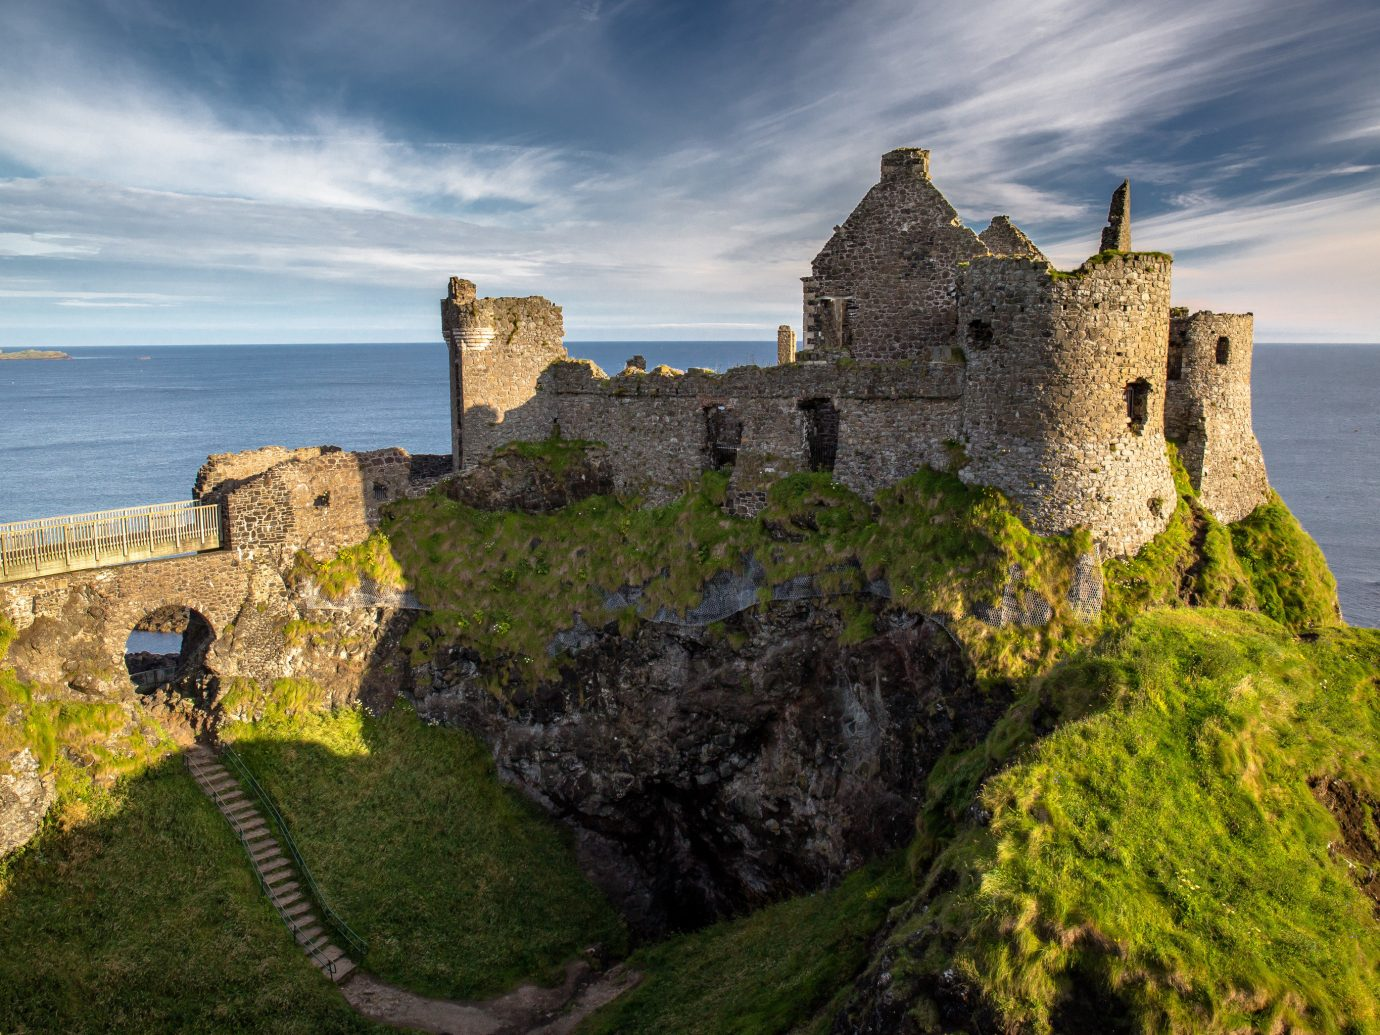 Offbeat sky building outdoor castle landmark Coast Ruins fortification cliff Sea rock tower château landscape terrain ancient history monastery